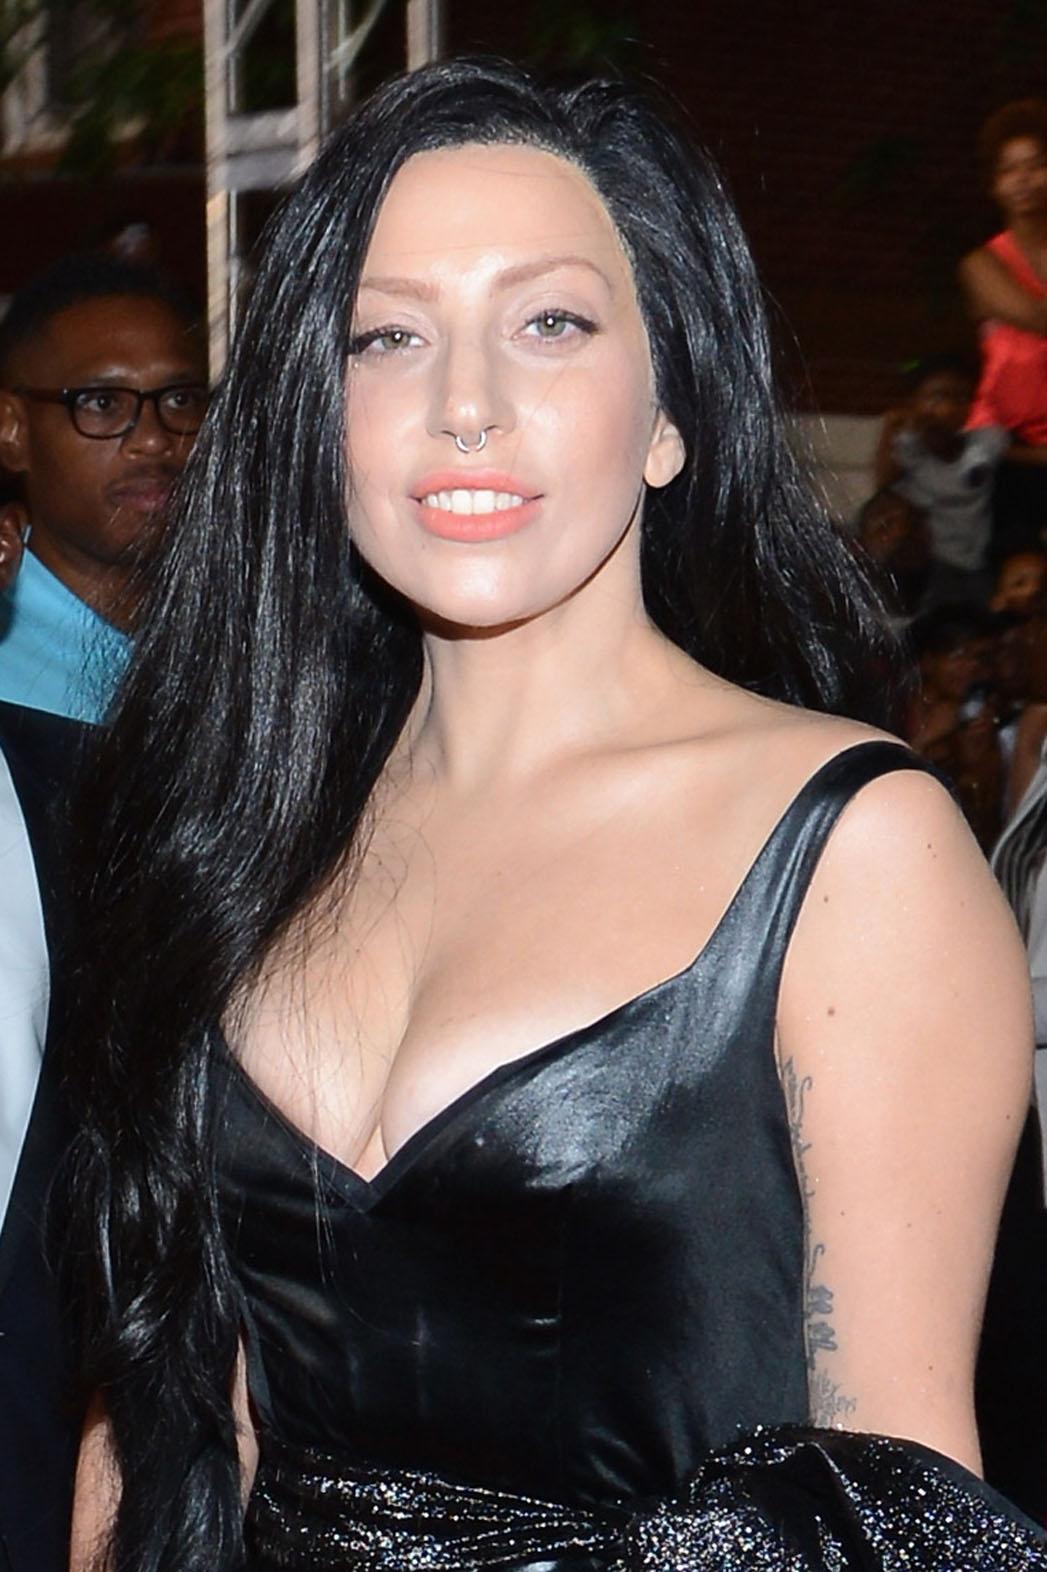 Lady Gaga Headshot - P 2013